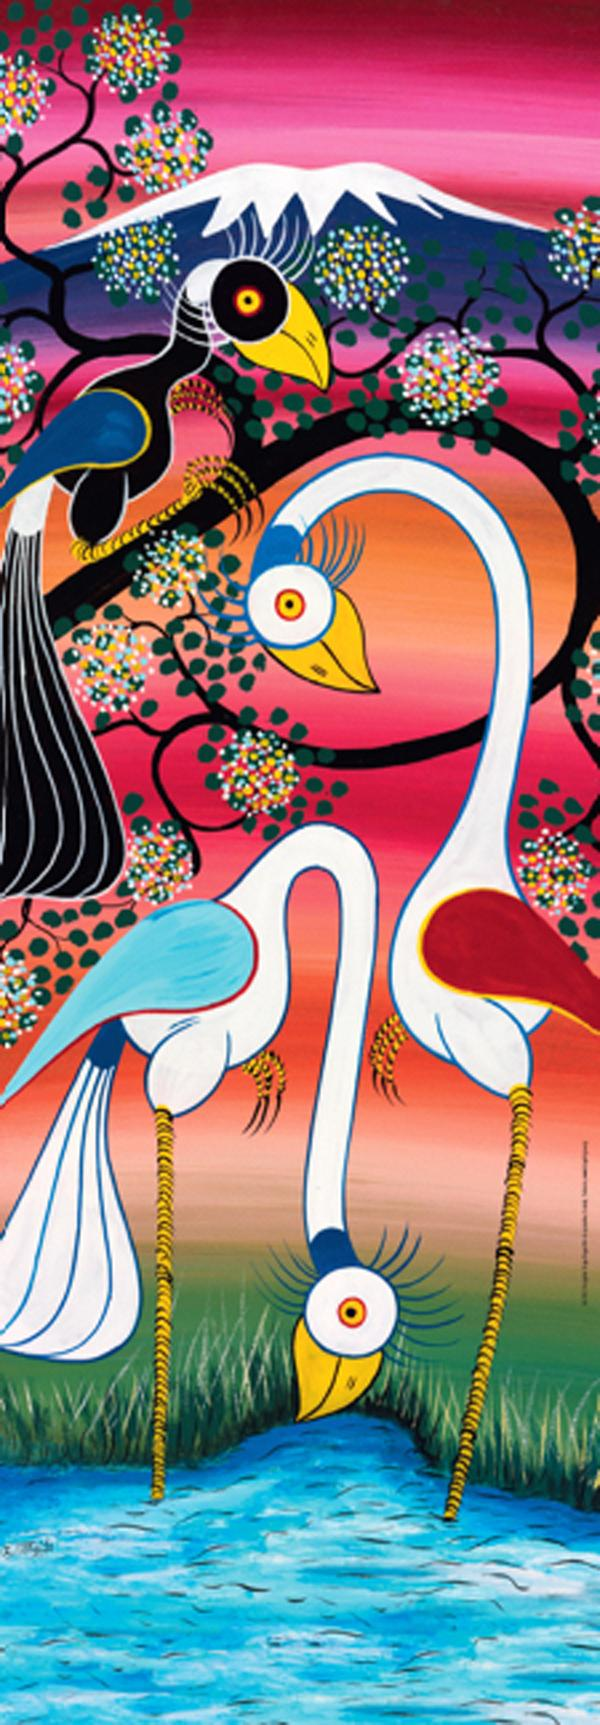 Tinga Tinga, Storks Contemporary & Modern Art Jigsaw Puzzle